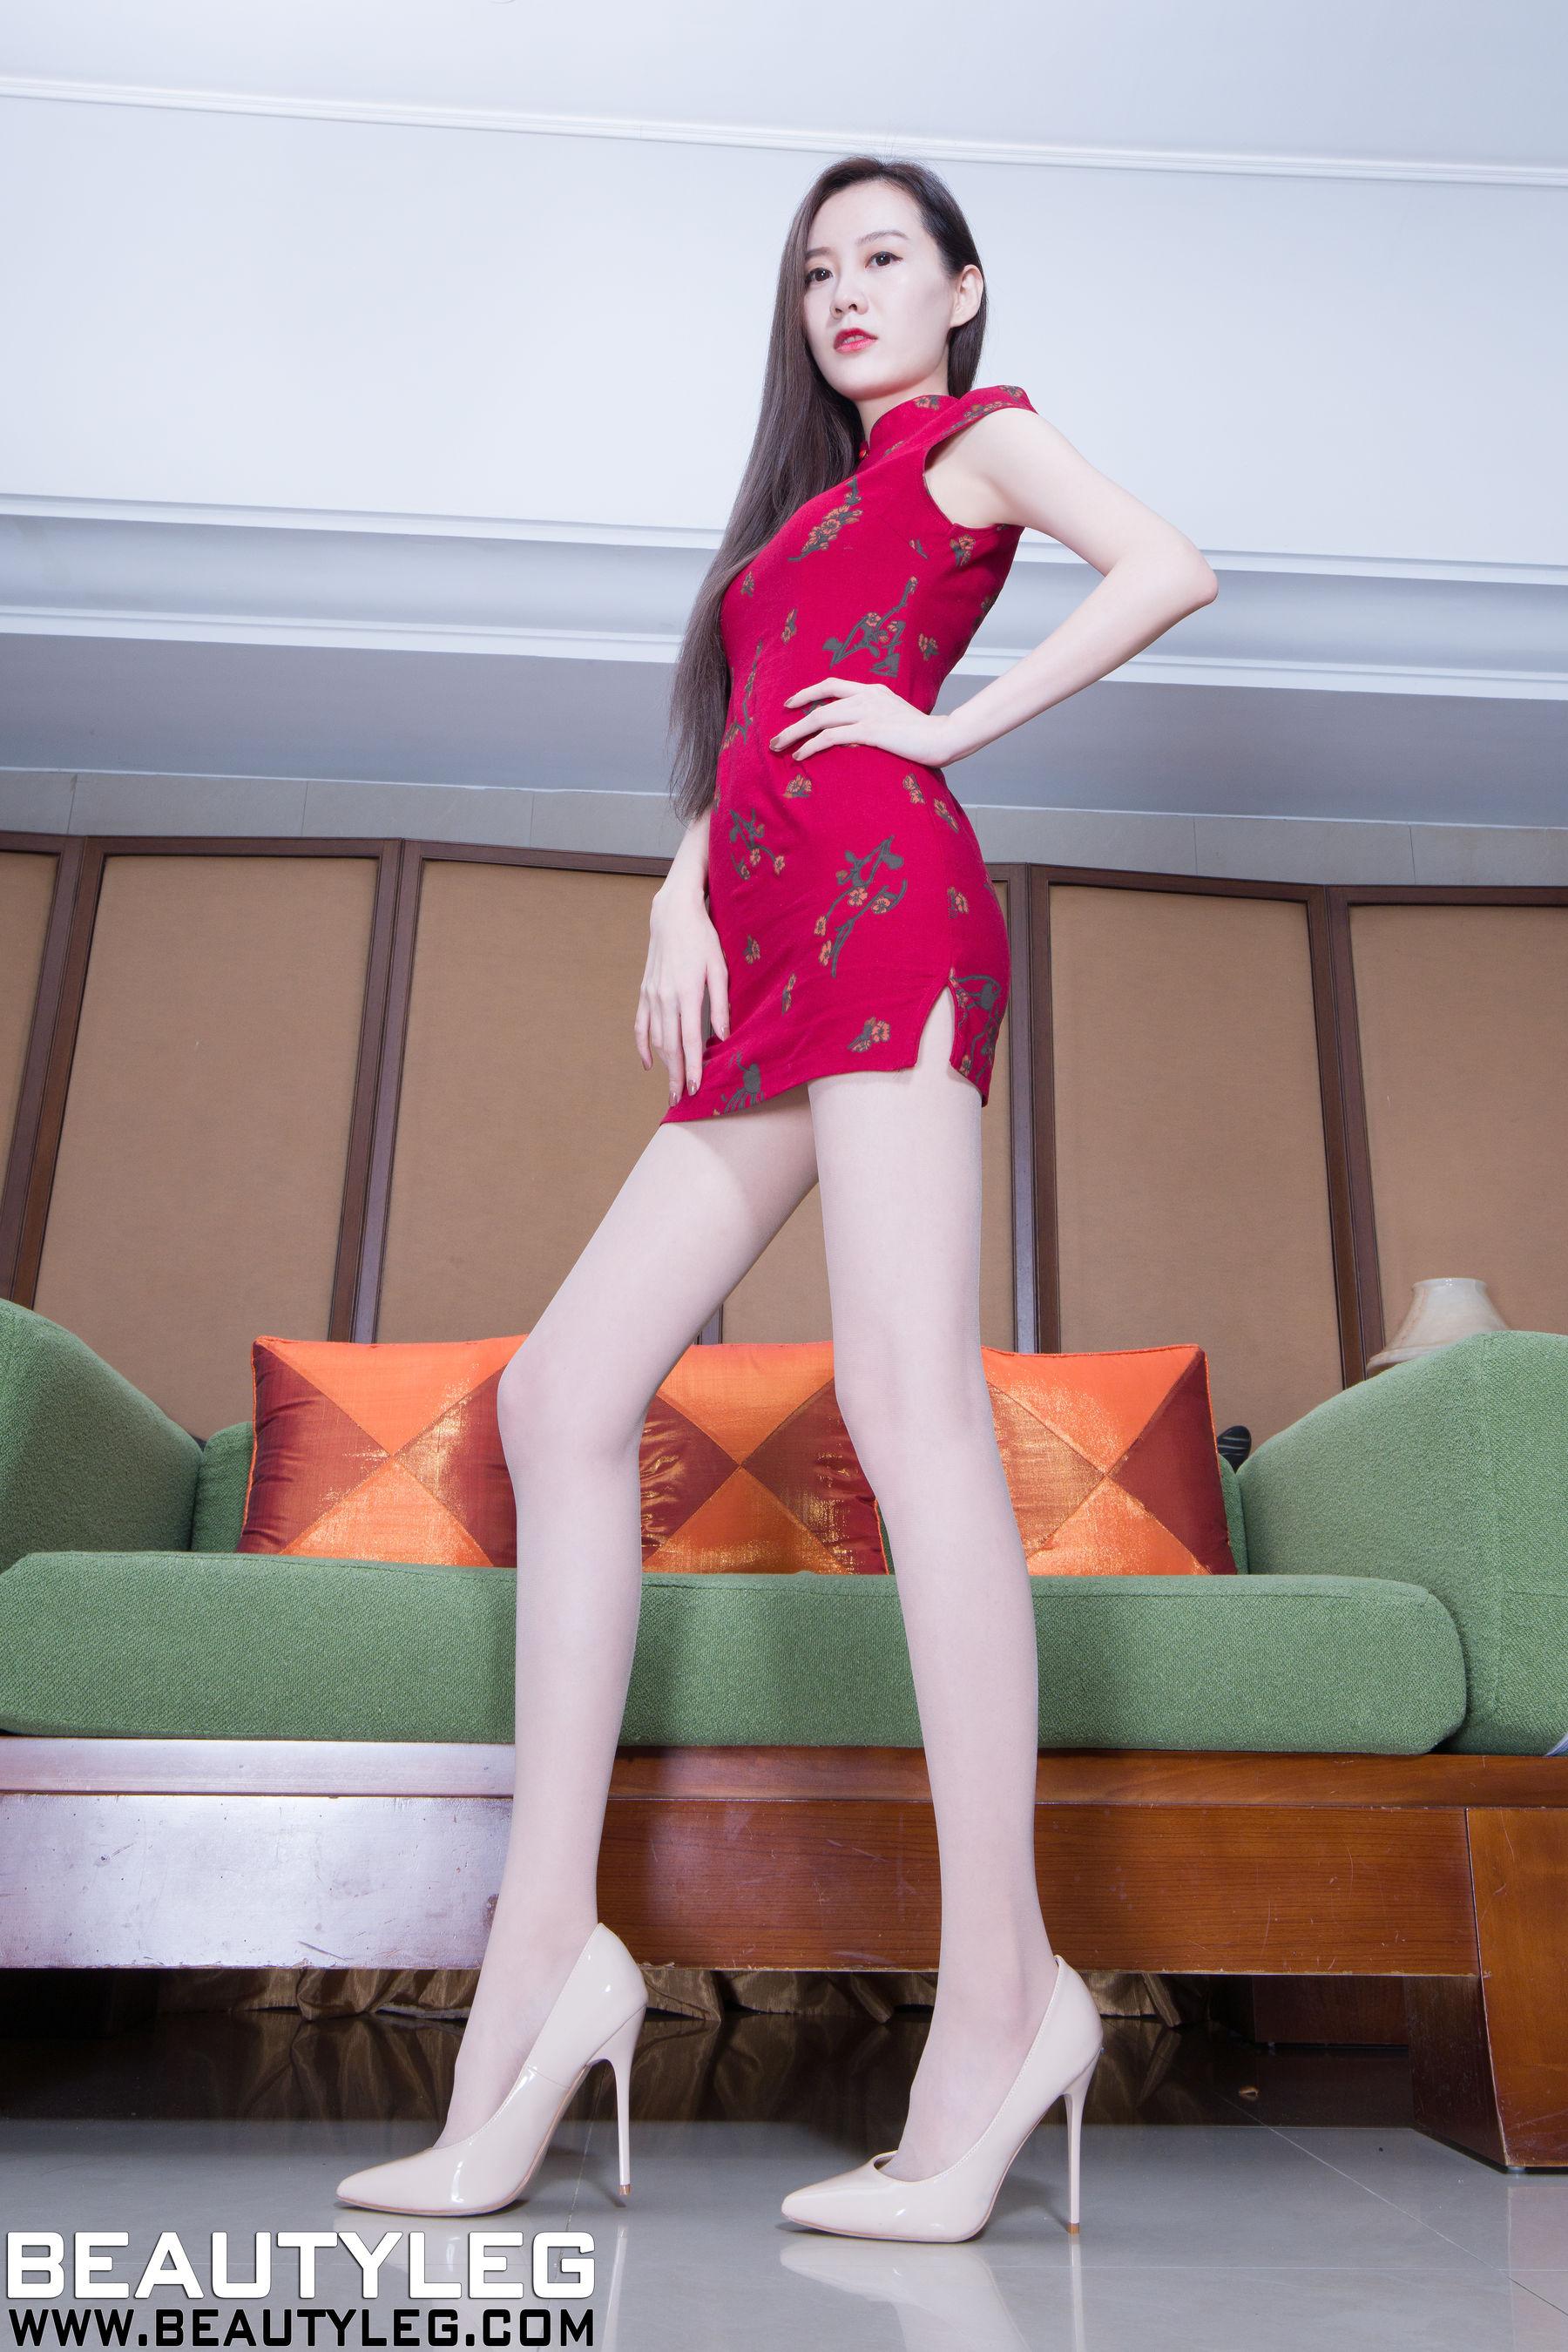 VOL.147 [Beautyleg]制服美腿长腿美女:汪佩妮(汪佩妮Penny)超高清个人性感漂亮大图(50P)